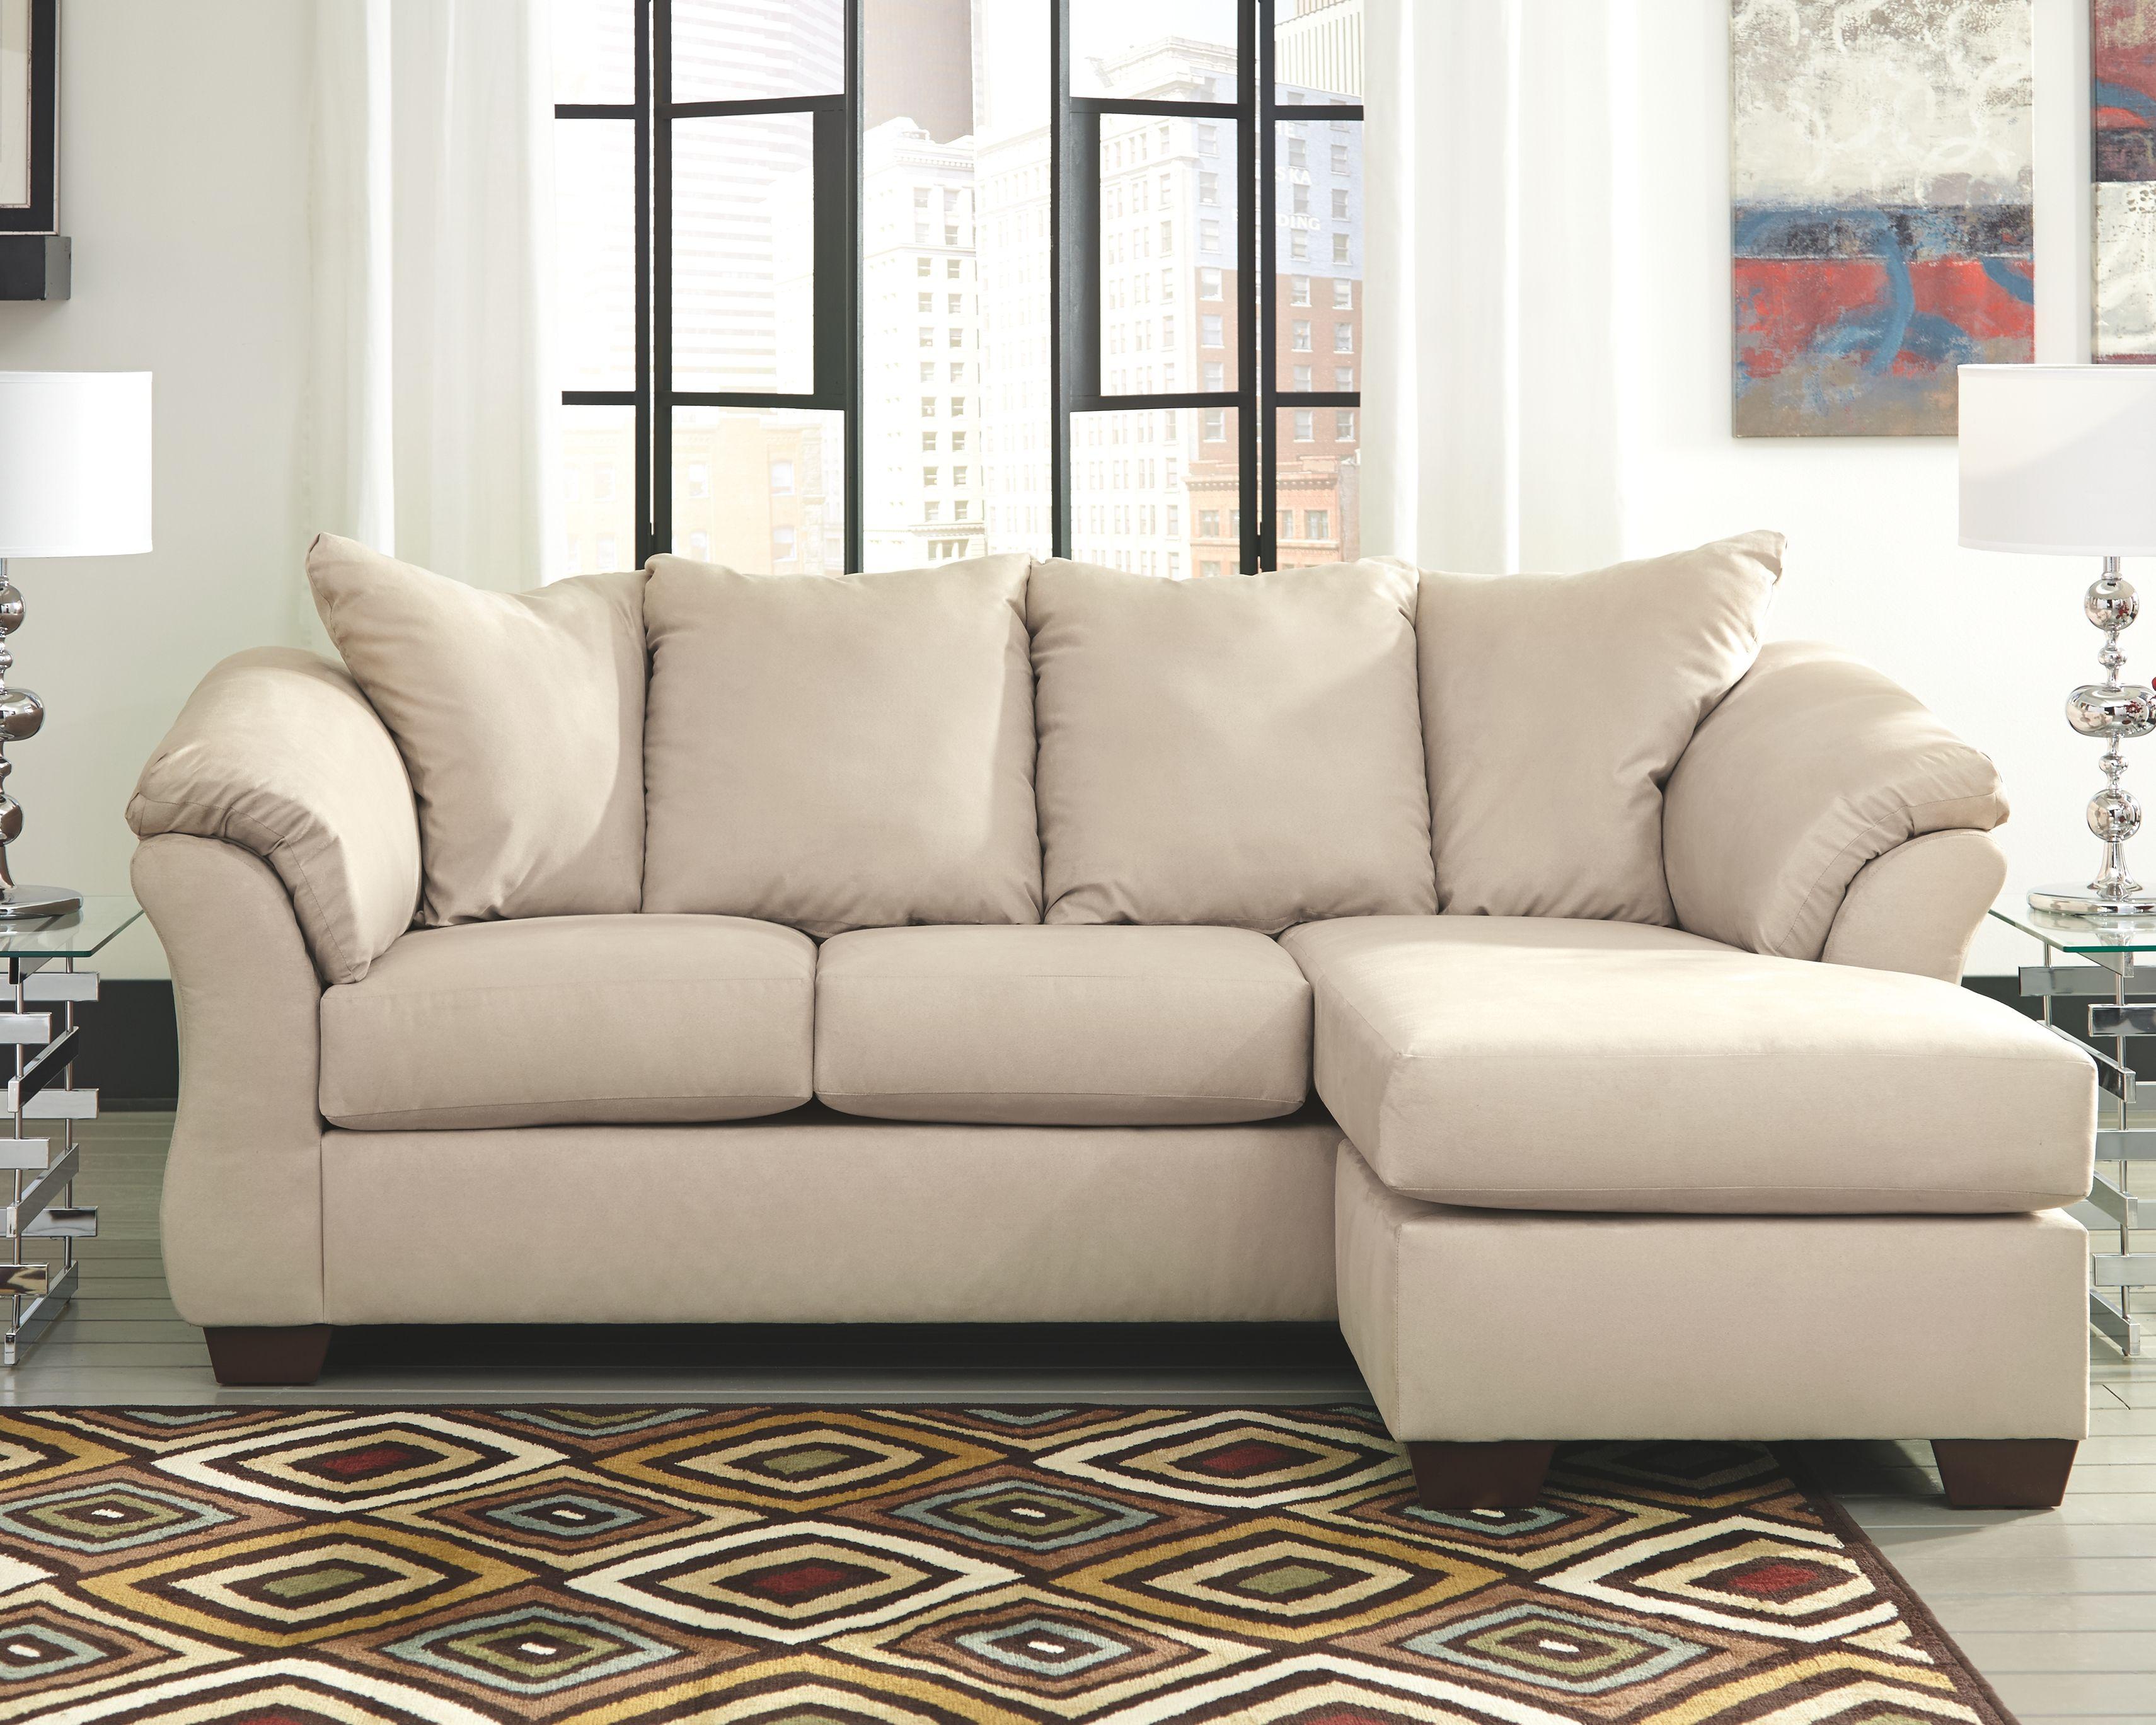 Magnificent Darcy Sofa Chaise Products Chaise Sofa Small Sectional Frankydiablos Diy Chair Ideas Frankydiabloscom